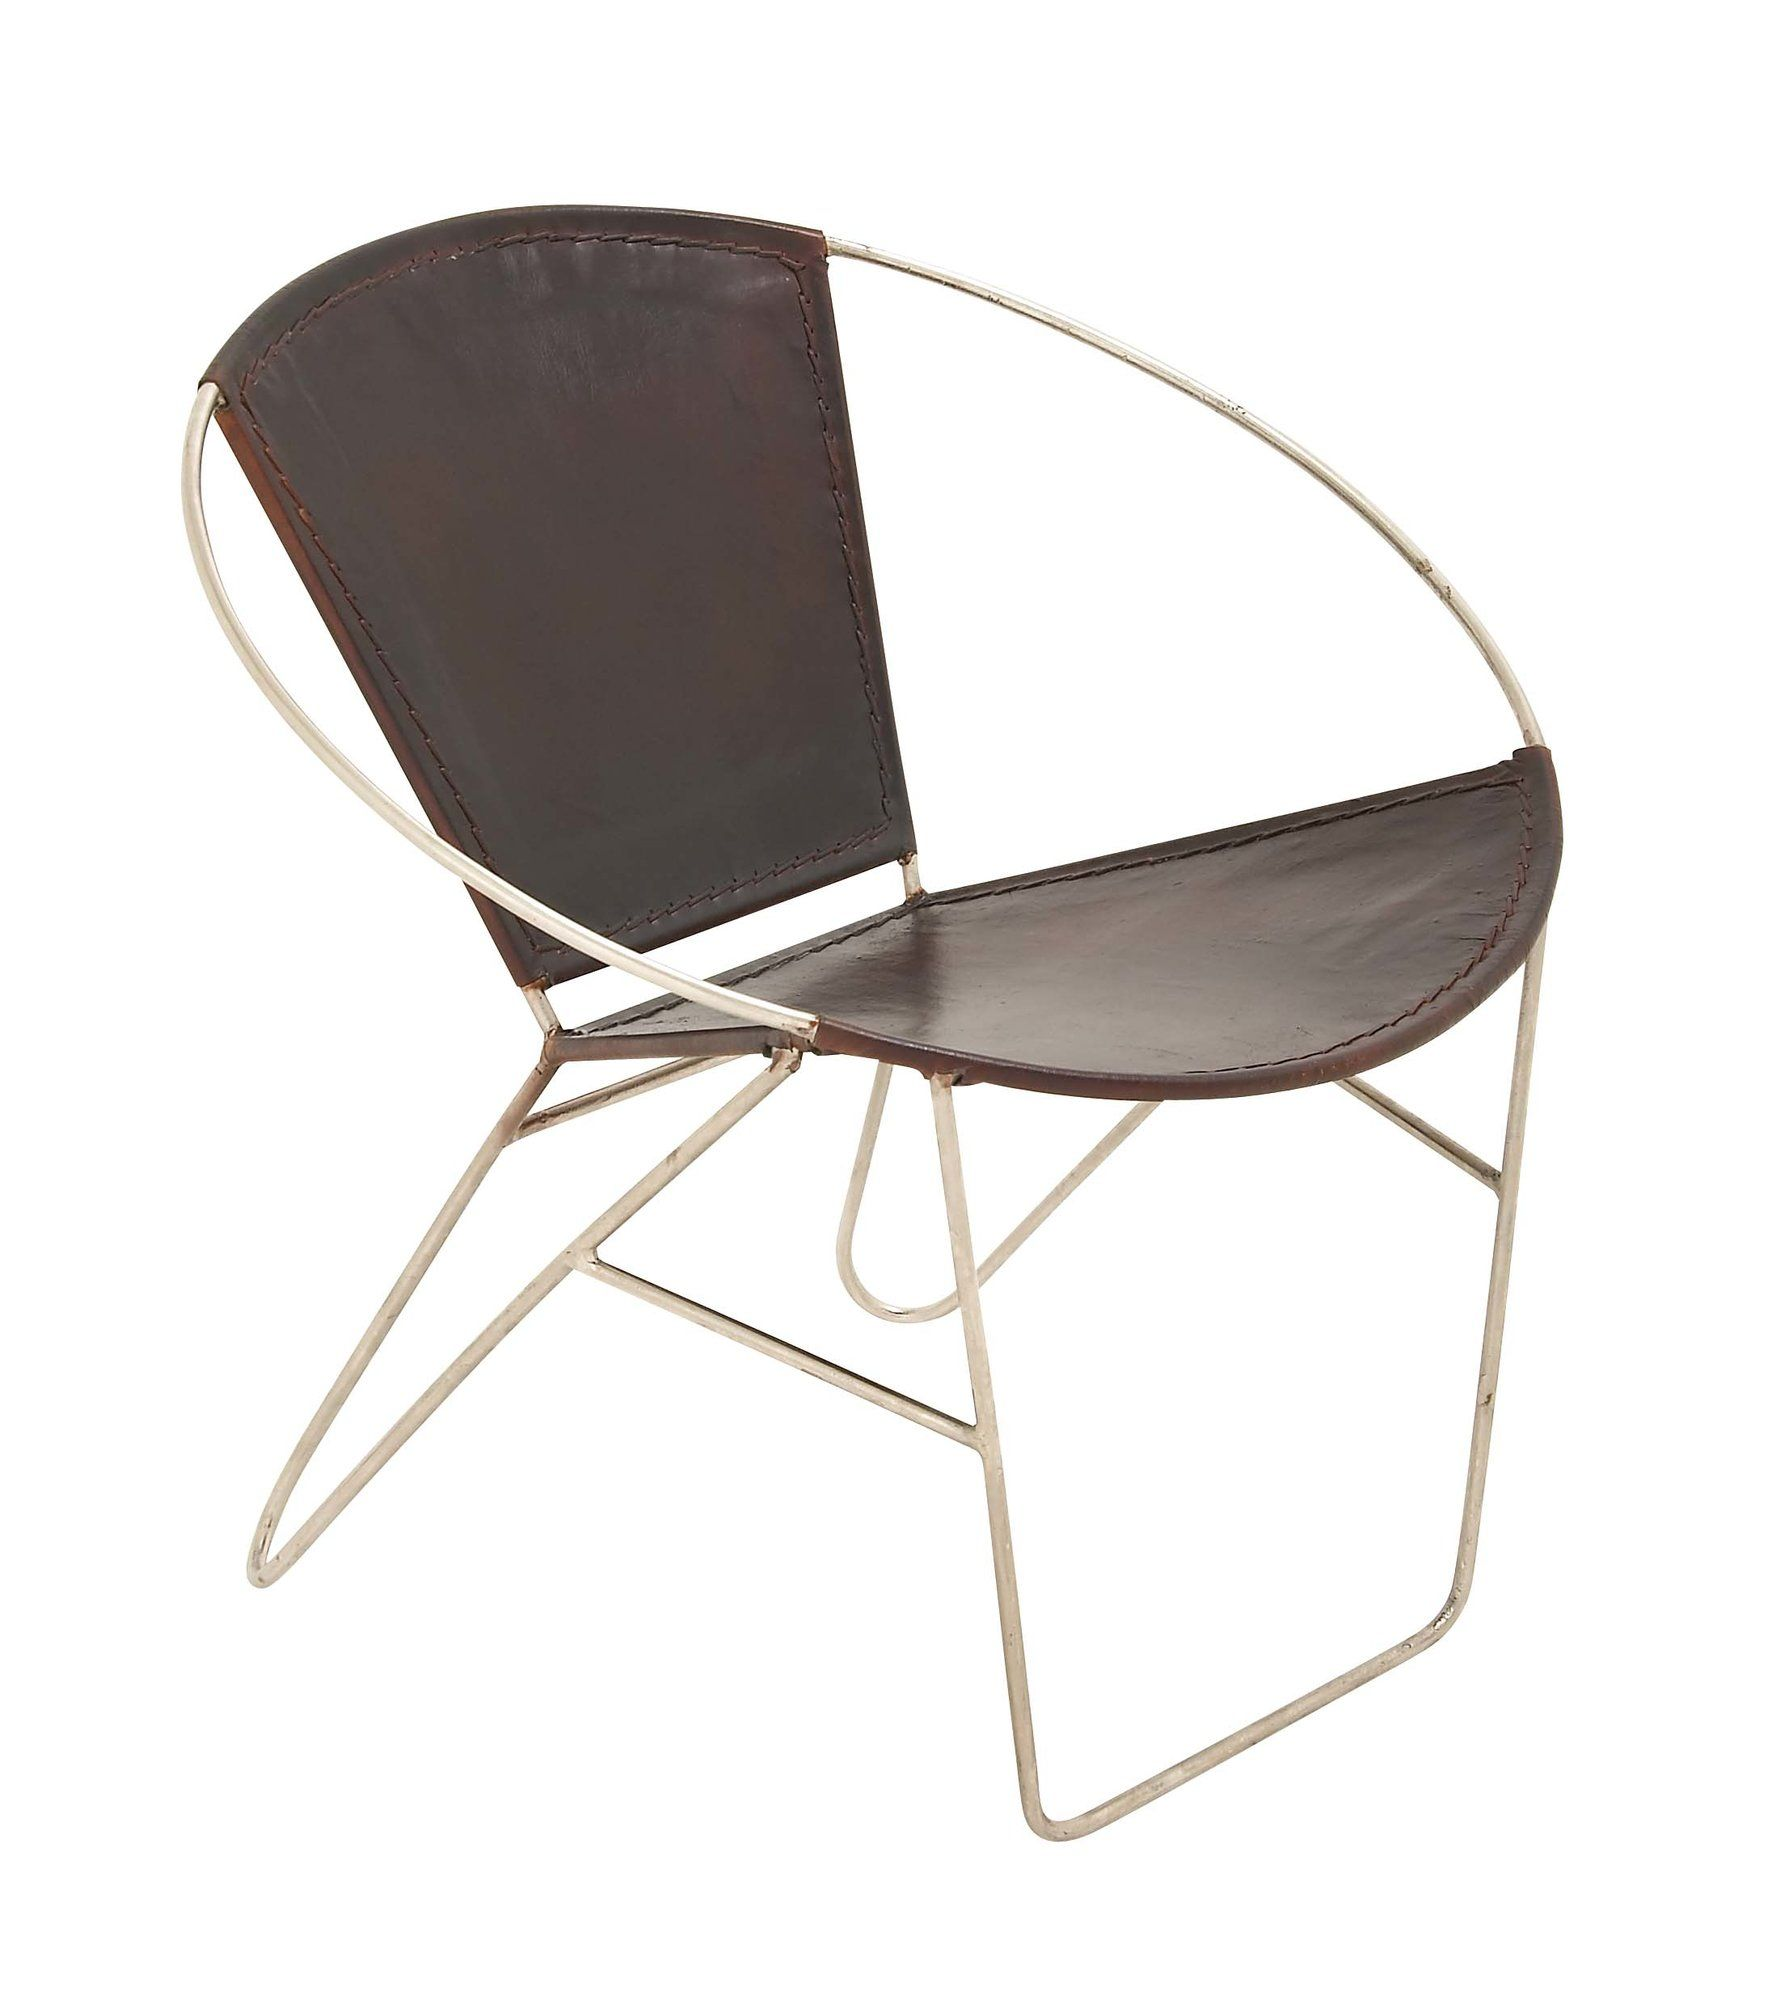 Metal Real Leather Papasan Chair | Products | Pinterest | Papasan ...